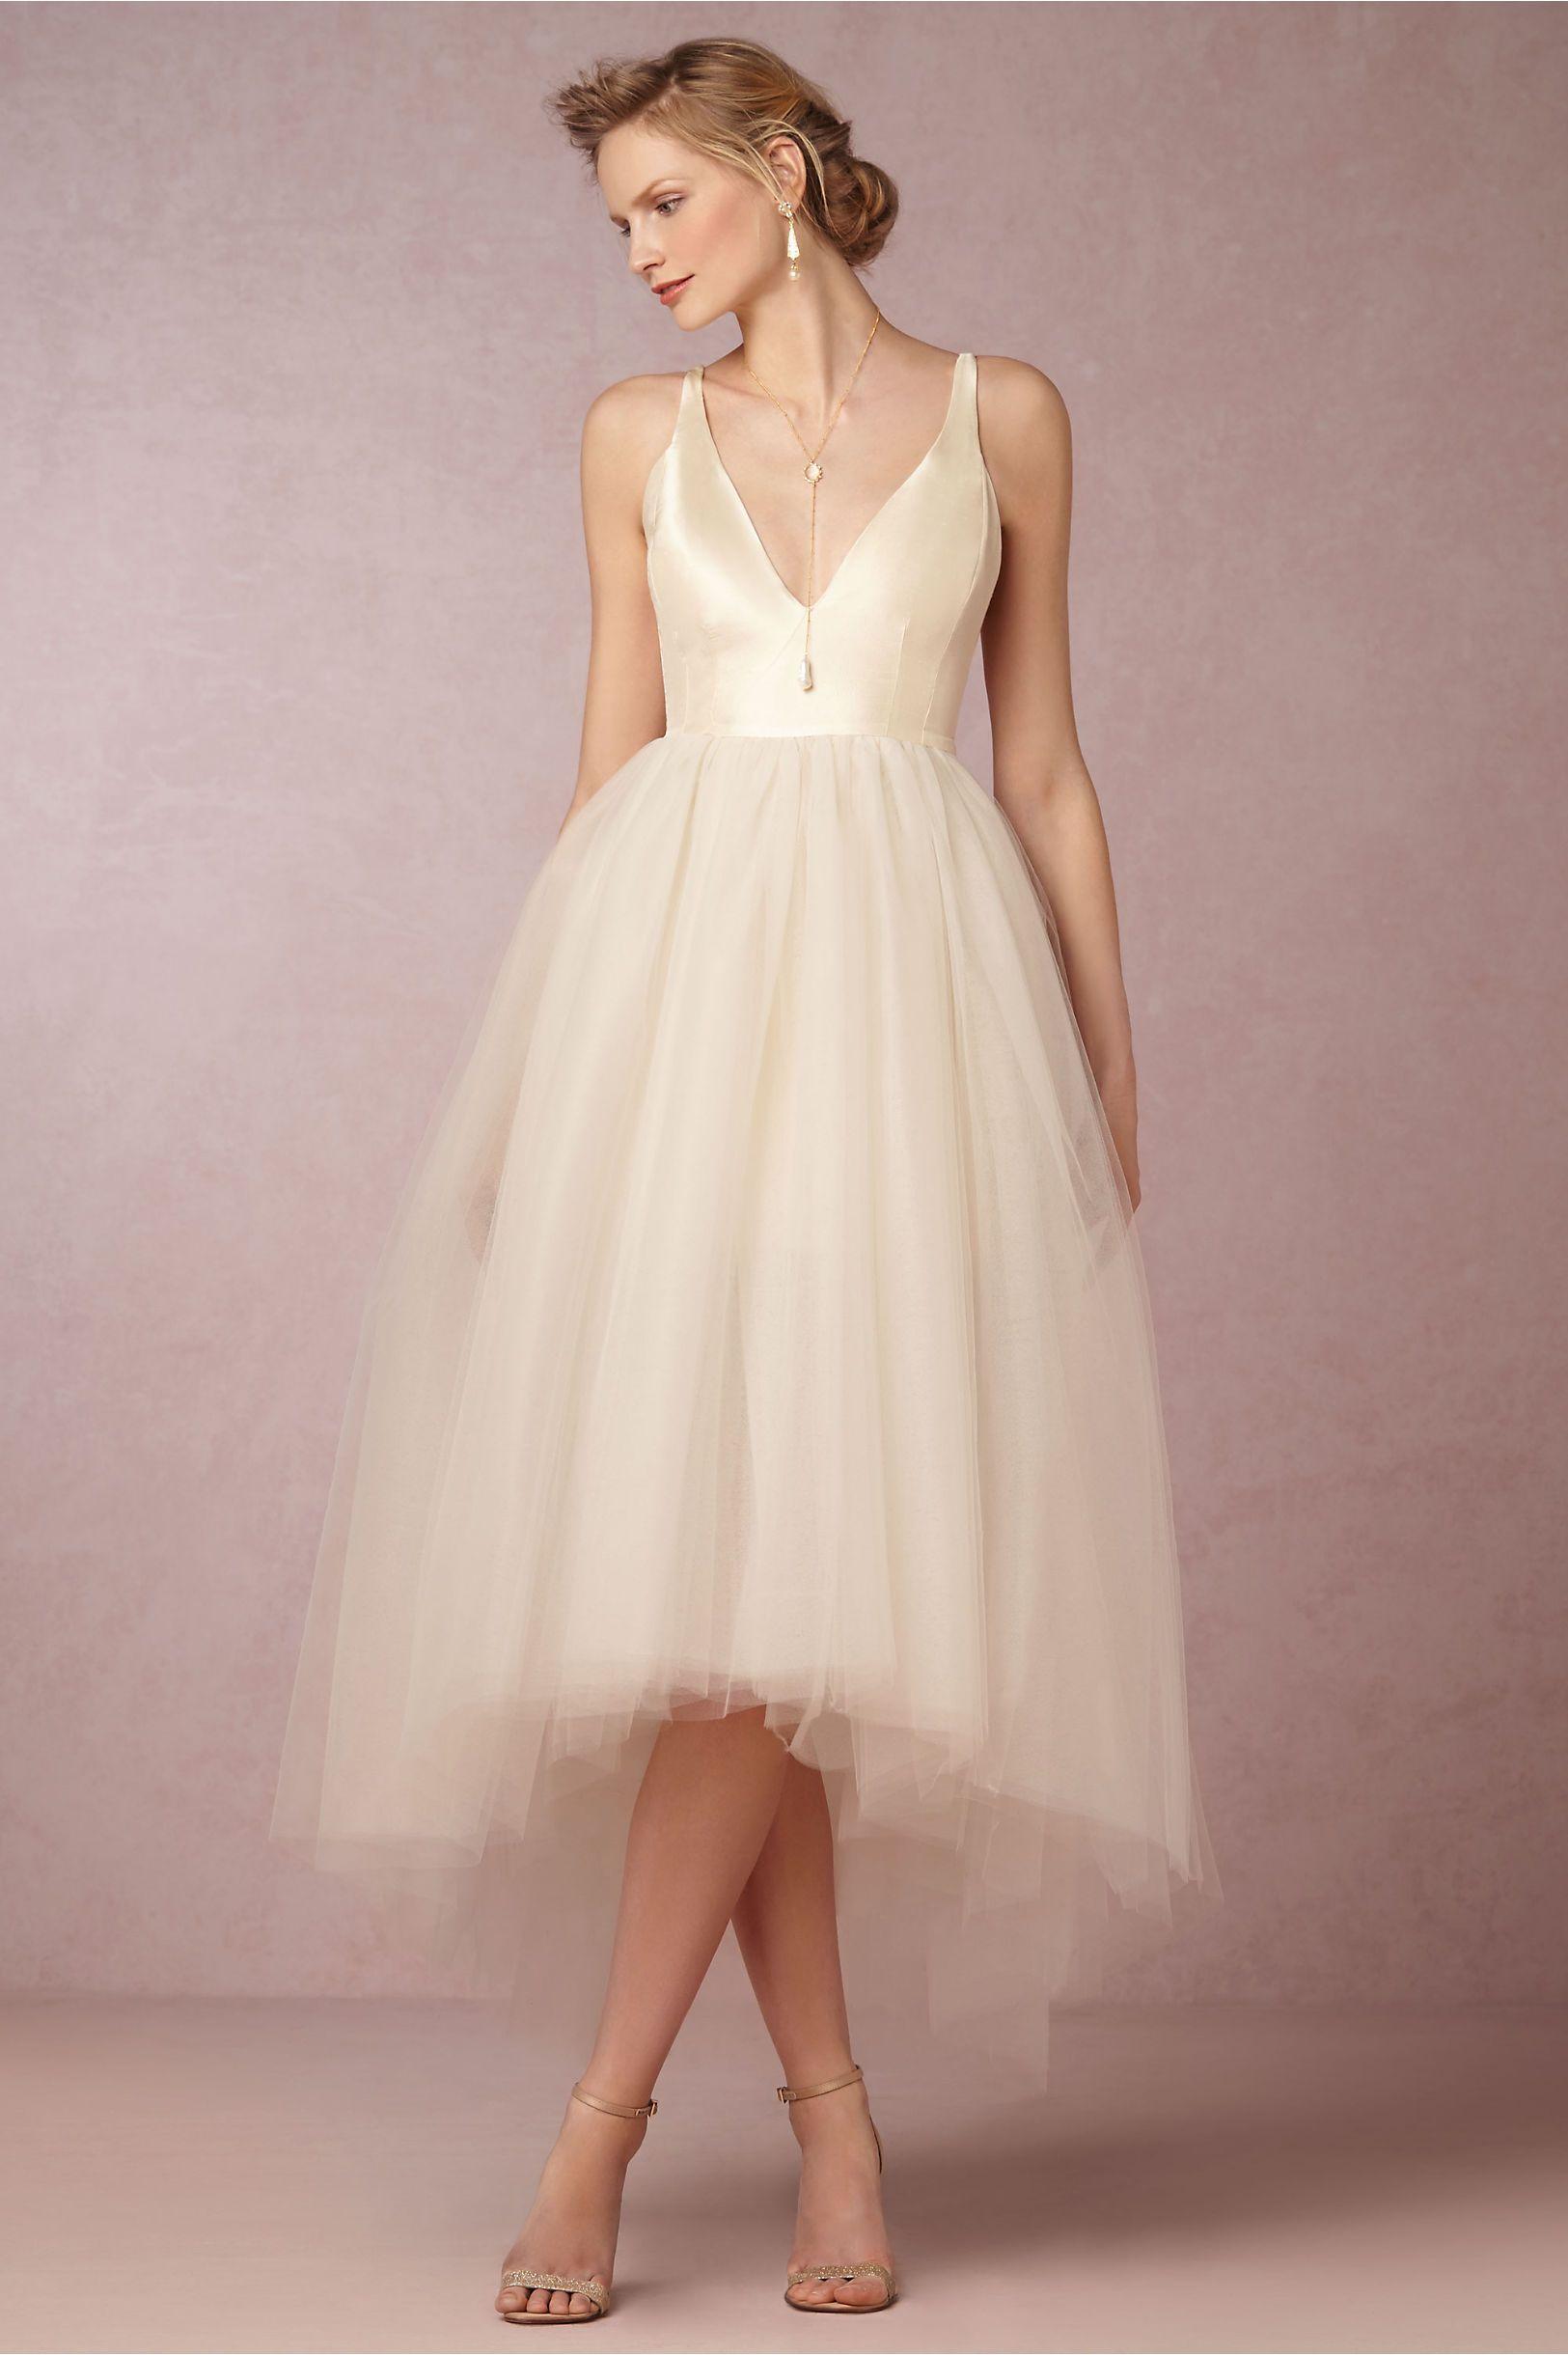 BHLDN Gillian Tulle Dress | Tulle dress, Wedding dress and Weddings